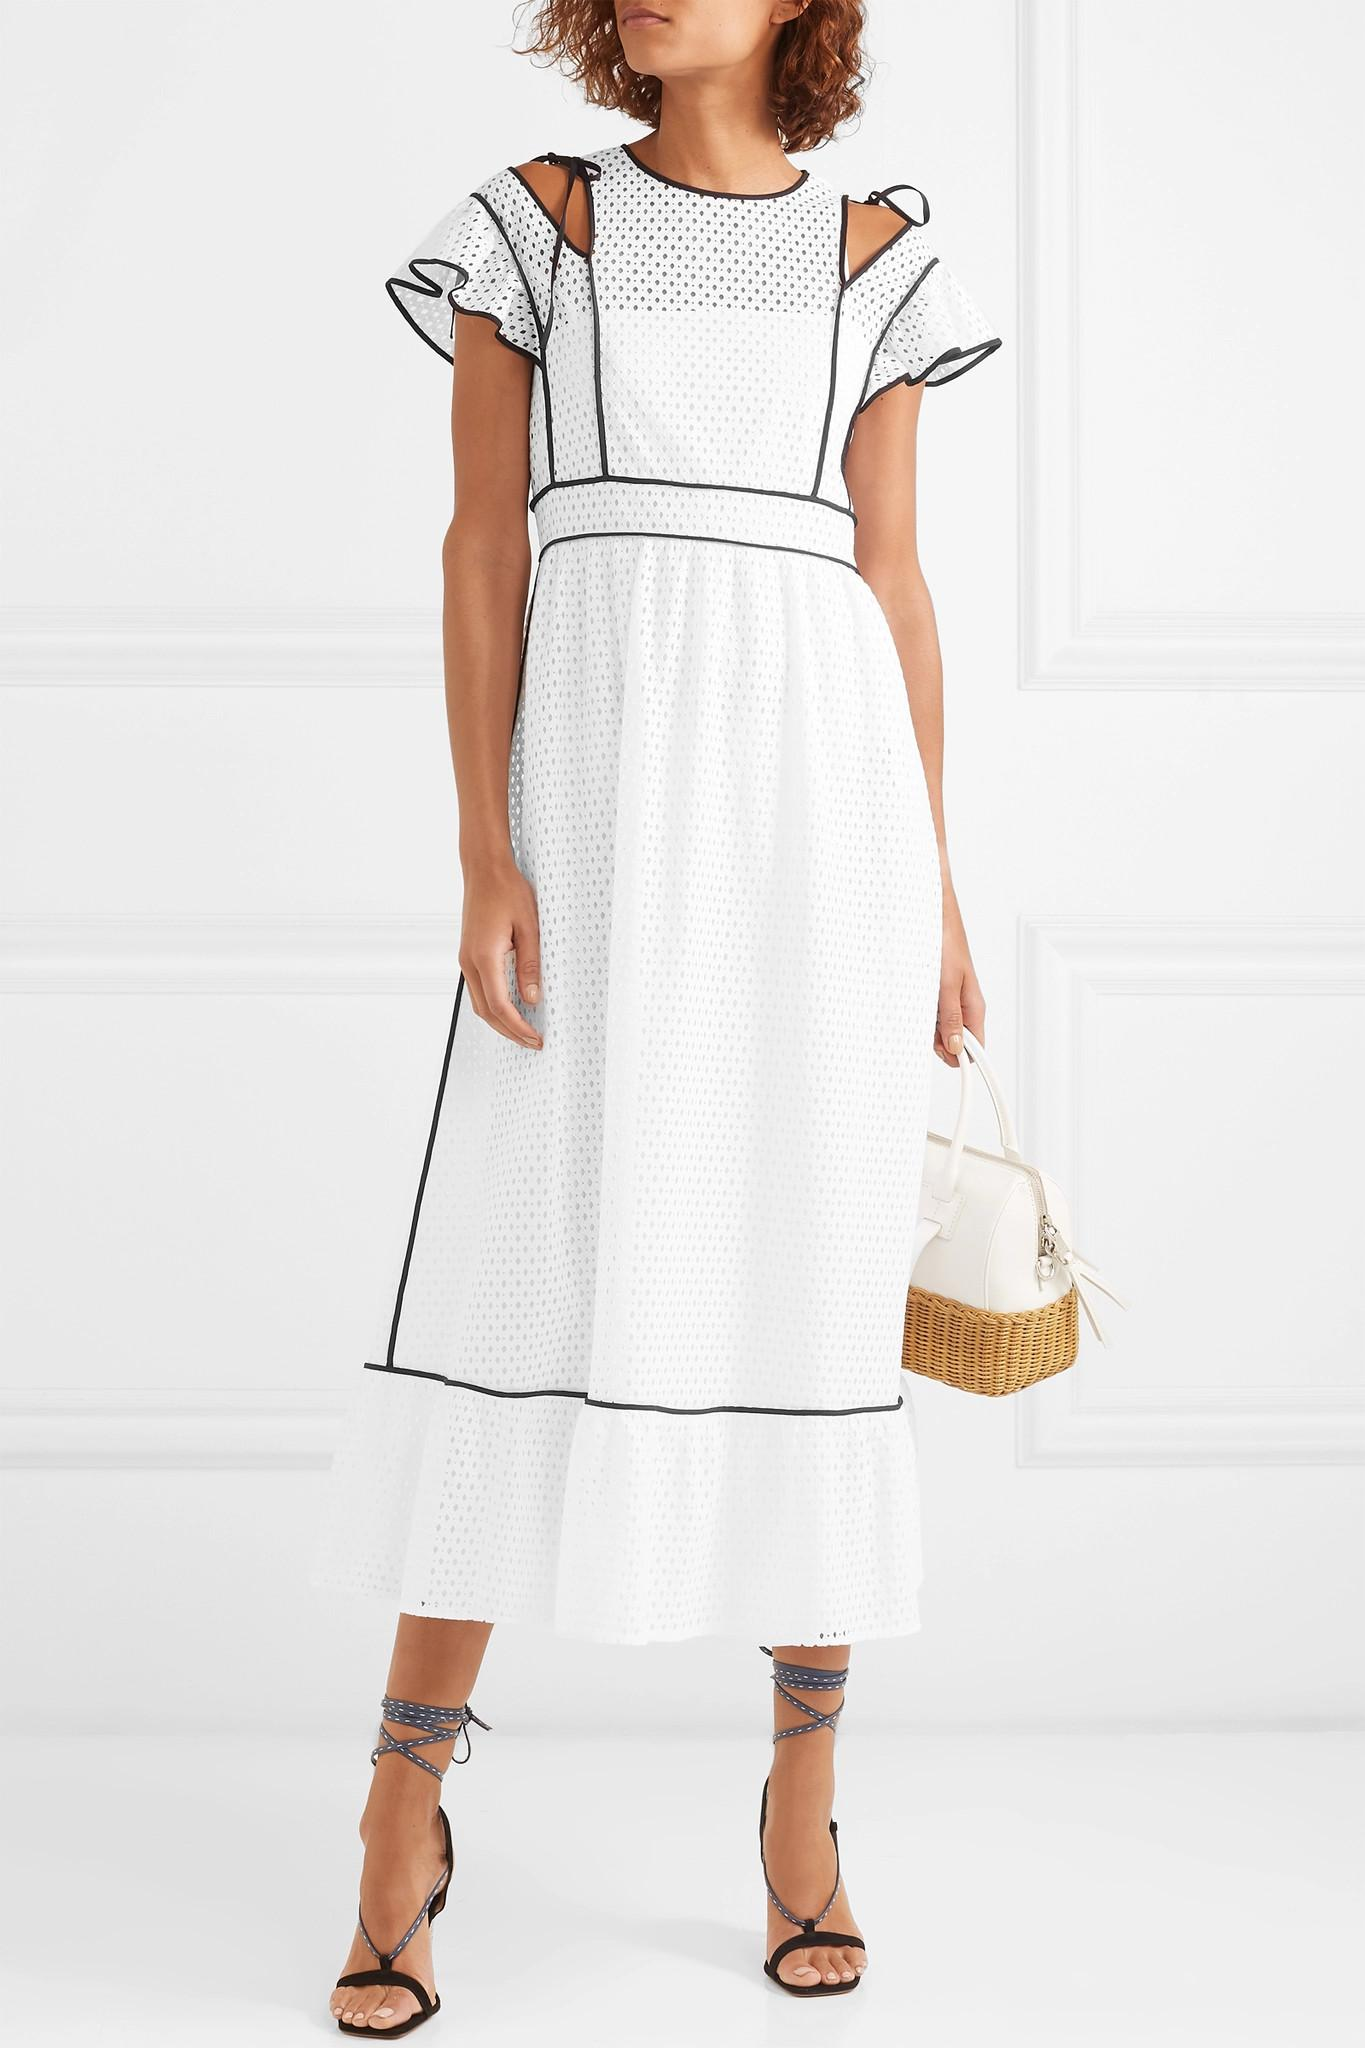 b95f4b5ddb9 ... White Cutout Ruffled Broderie Anglaise Woven Dress - Lyst. View  fullscreen